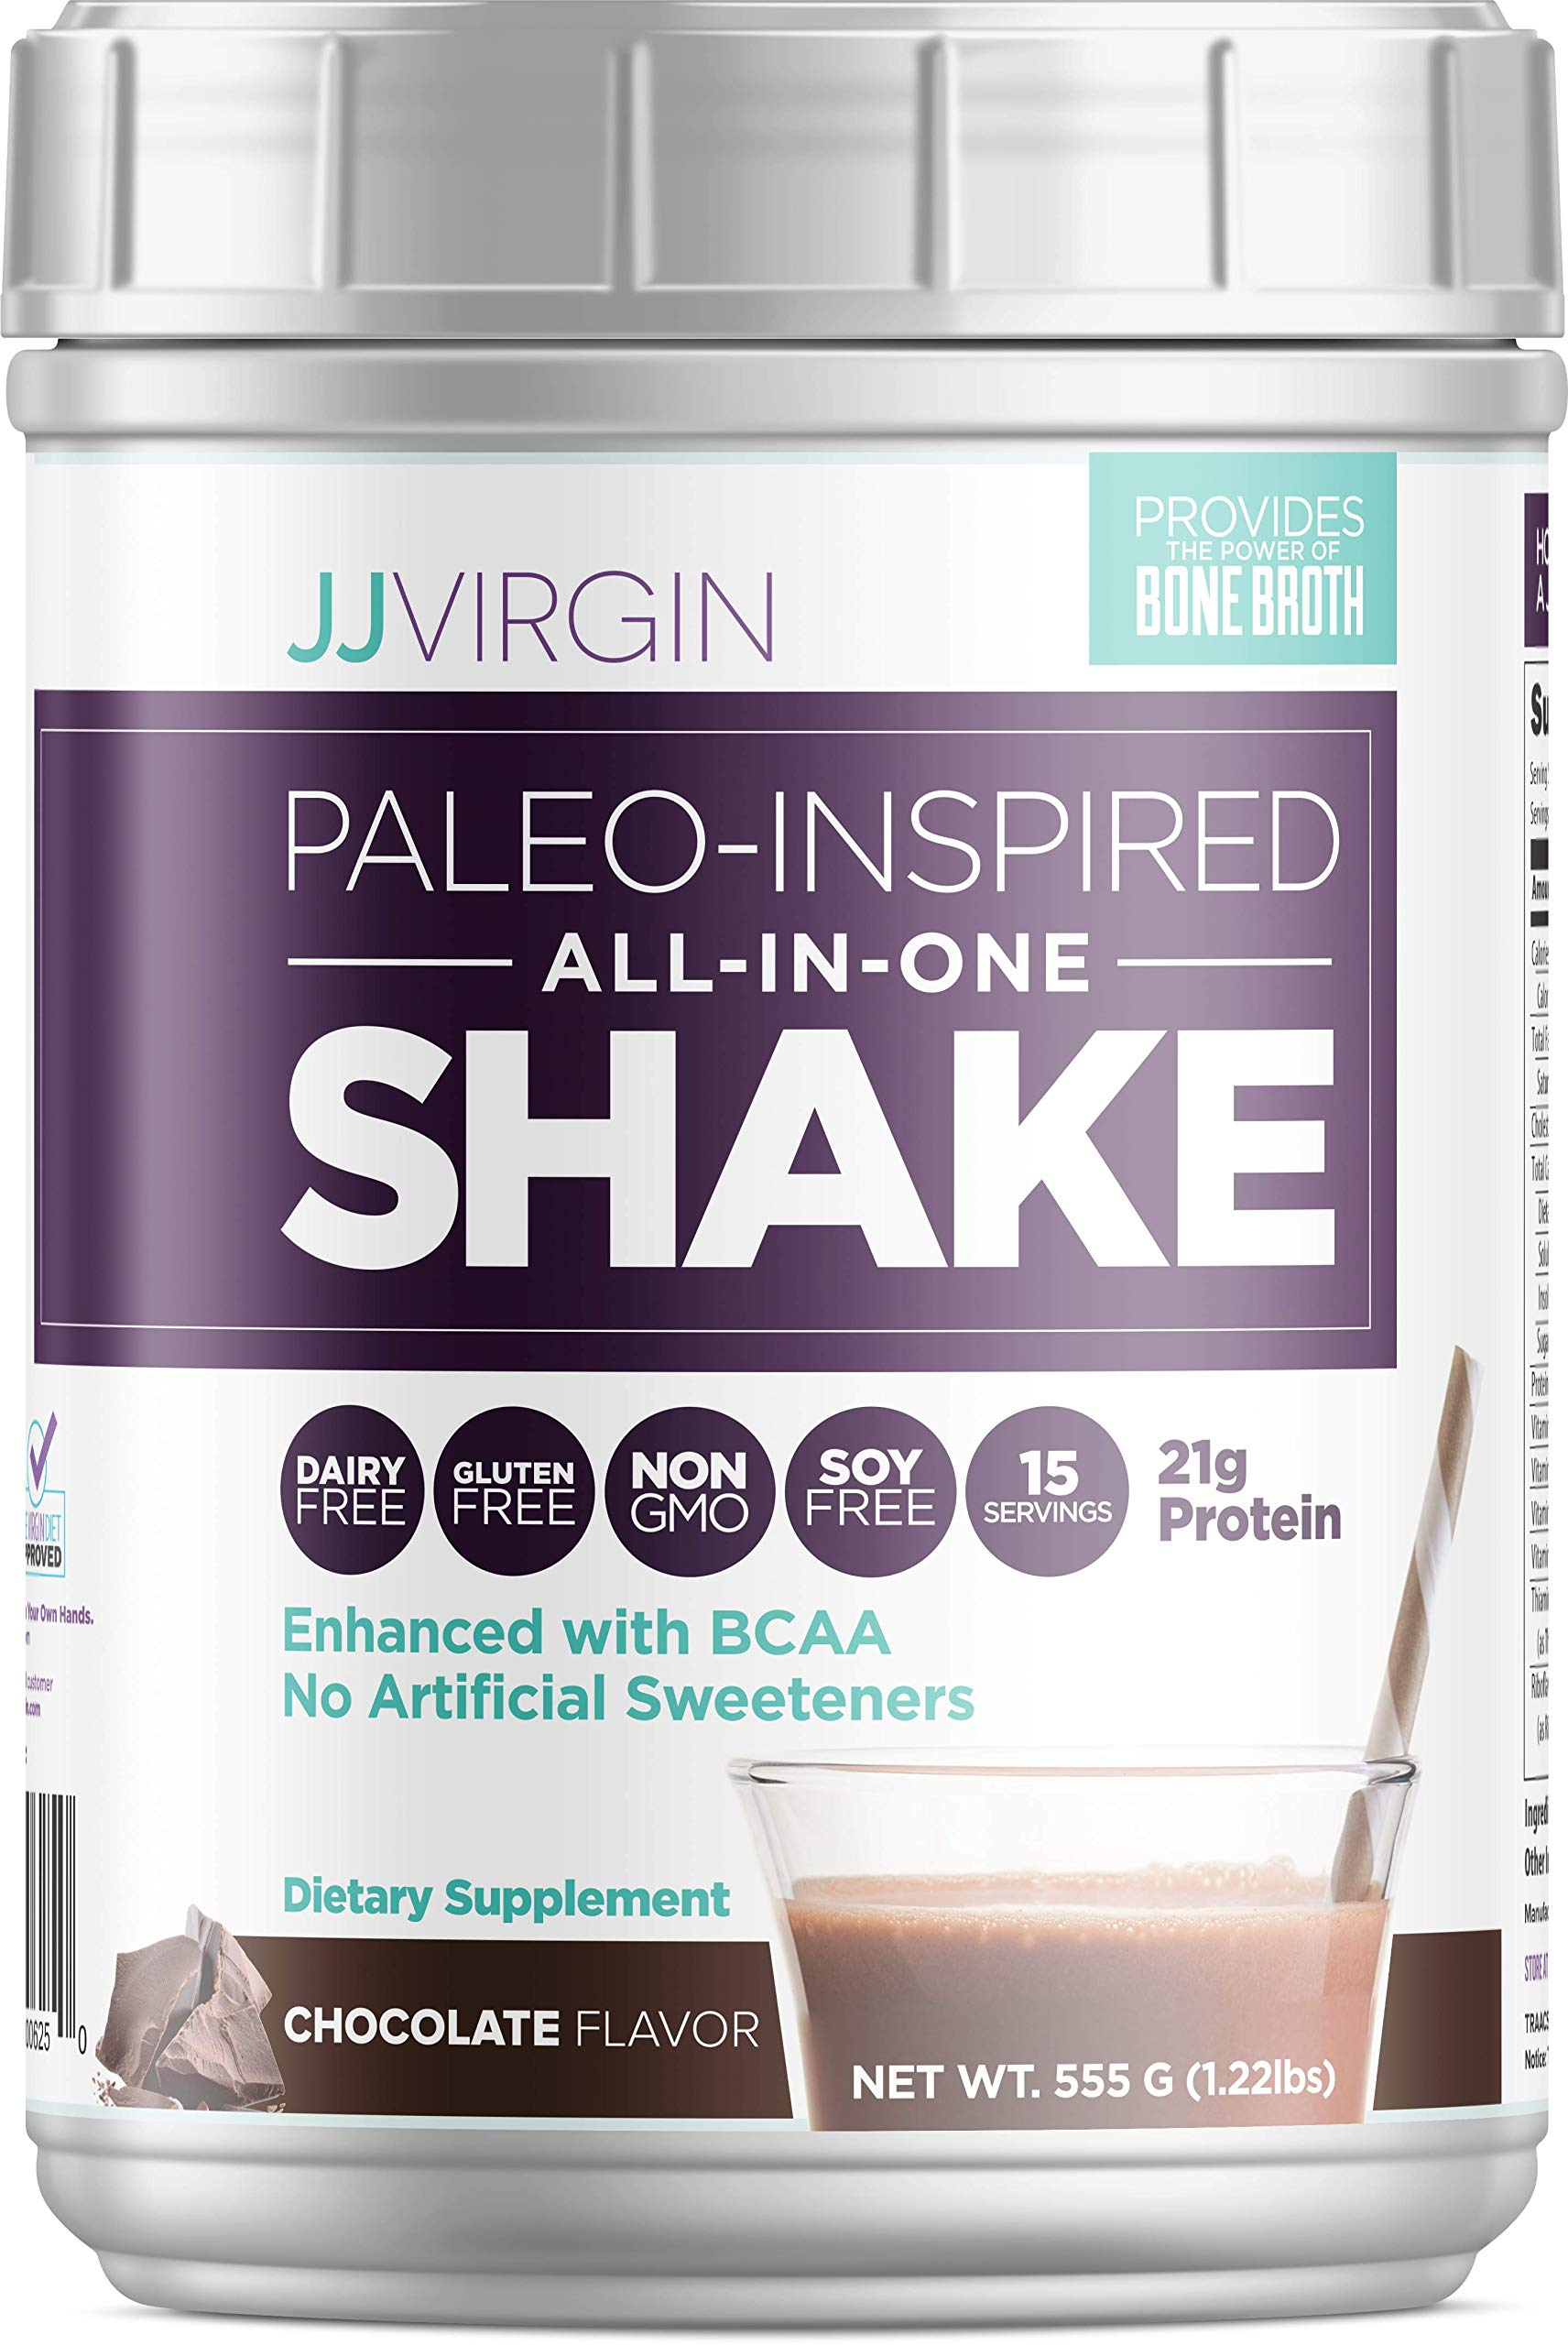 JJ Virgin Chocolate Paleo-Inspired All-in-One Shake - Paleo + Keto Friendly Protein Powder (15 Servings, 1.22 Pounds) by JJ VIRGIN